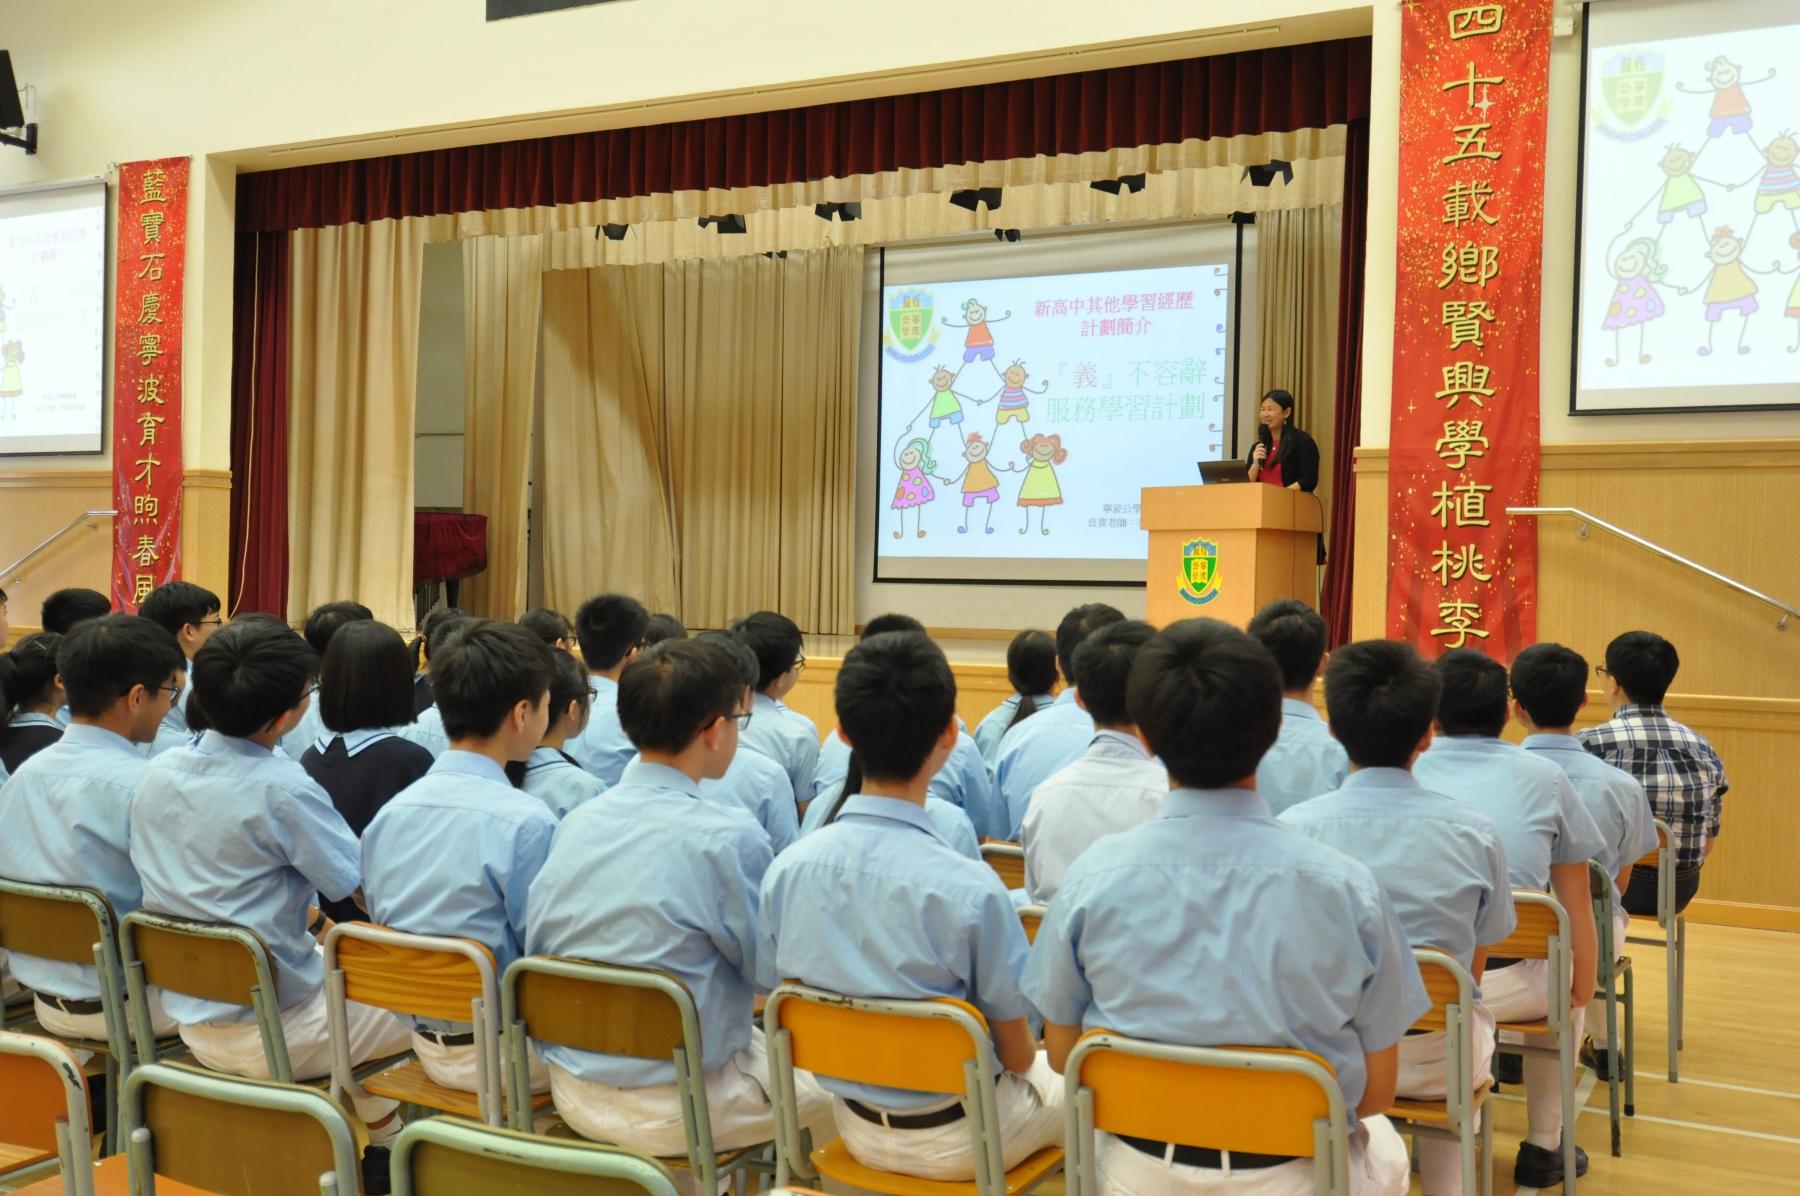 http://www.npc.edu.hk/sites/default/files/dsc_0189.jpg